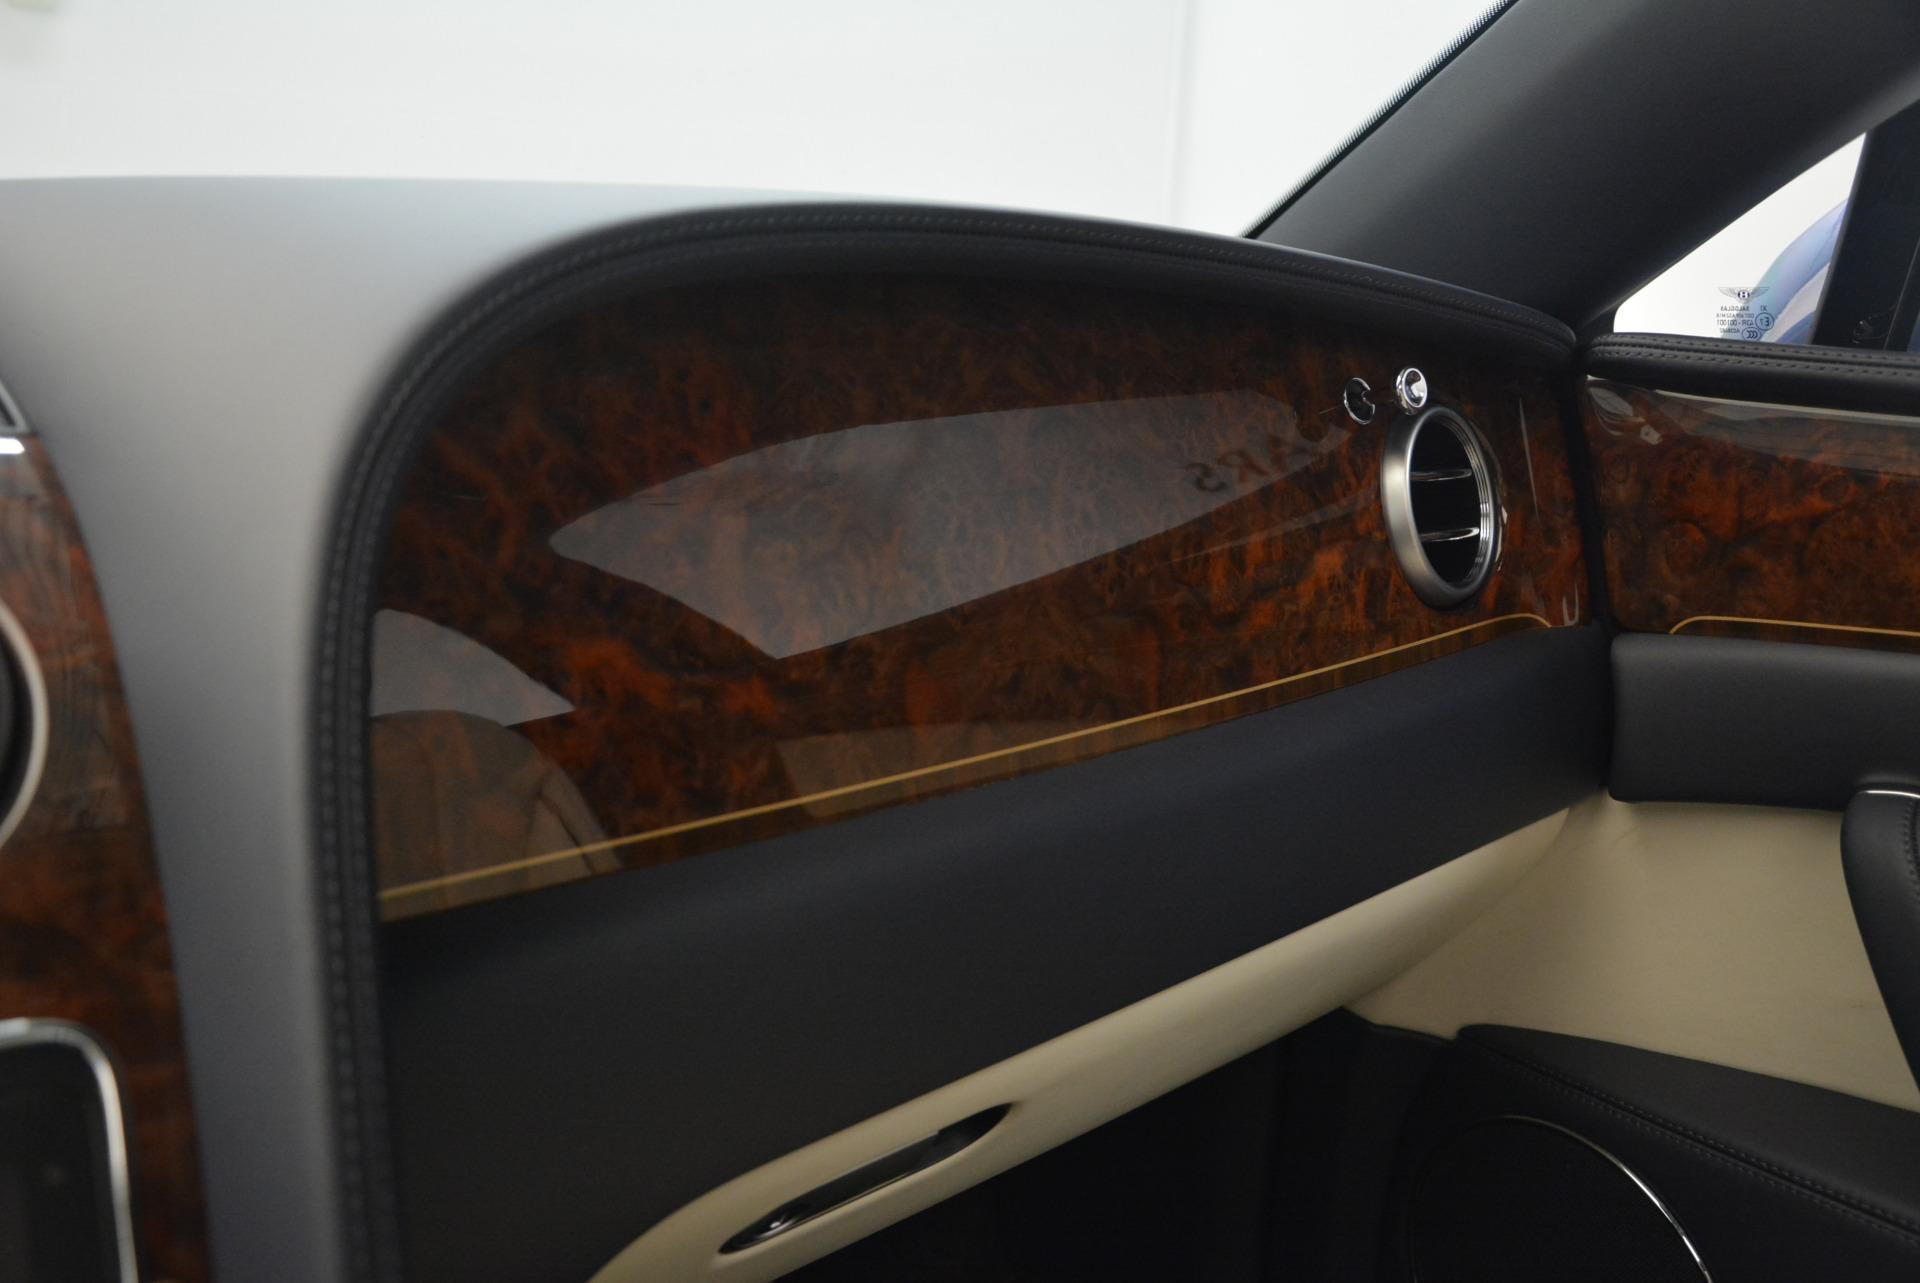 Used 2015 Bentley Flying Spur W12 For Sale In Westport, CT 2339_p24